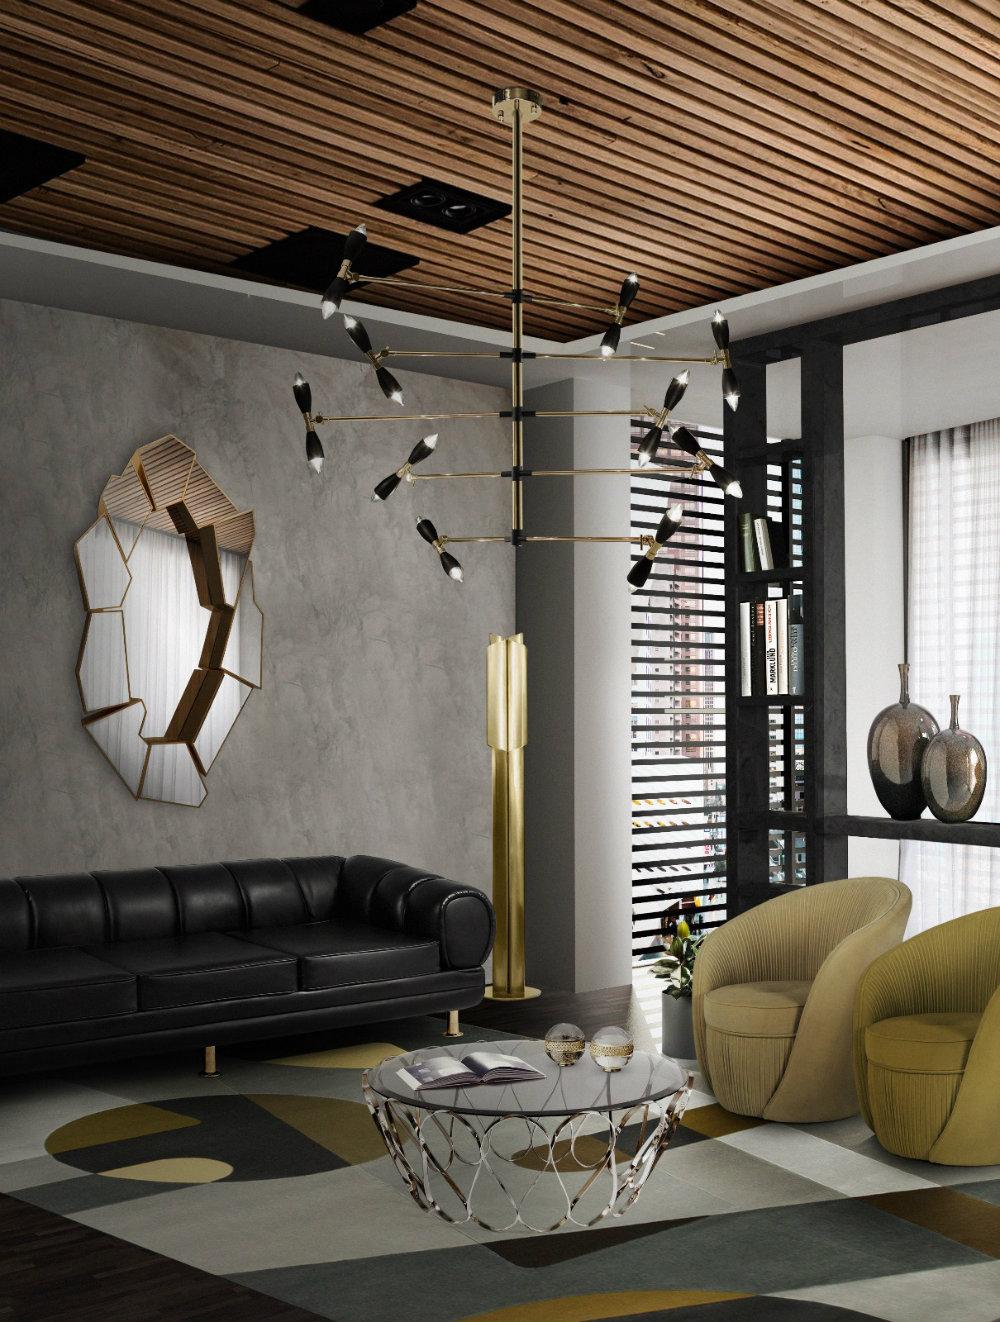 Best Summer 2019 Interior Design Trends 04 summer 2019 interior design trends Best Summer 2019 Interior Design Trends Best Summer 2019 Interior Design Trends 04